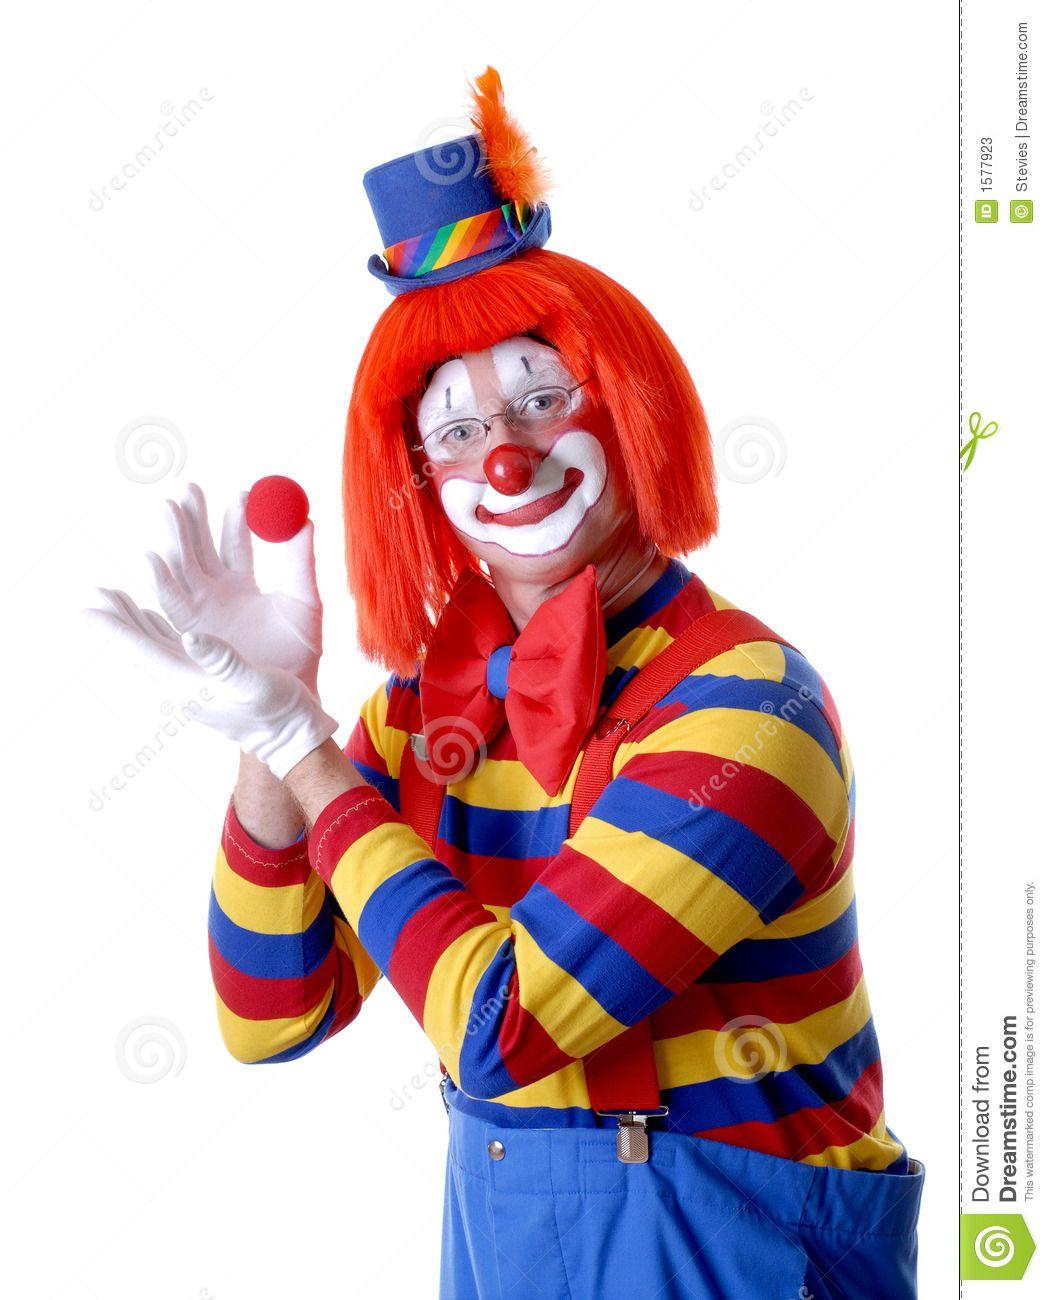 Clown pictures google search clowns clown costumes - Circus joker wallpaper ...